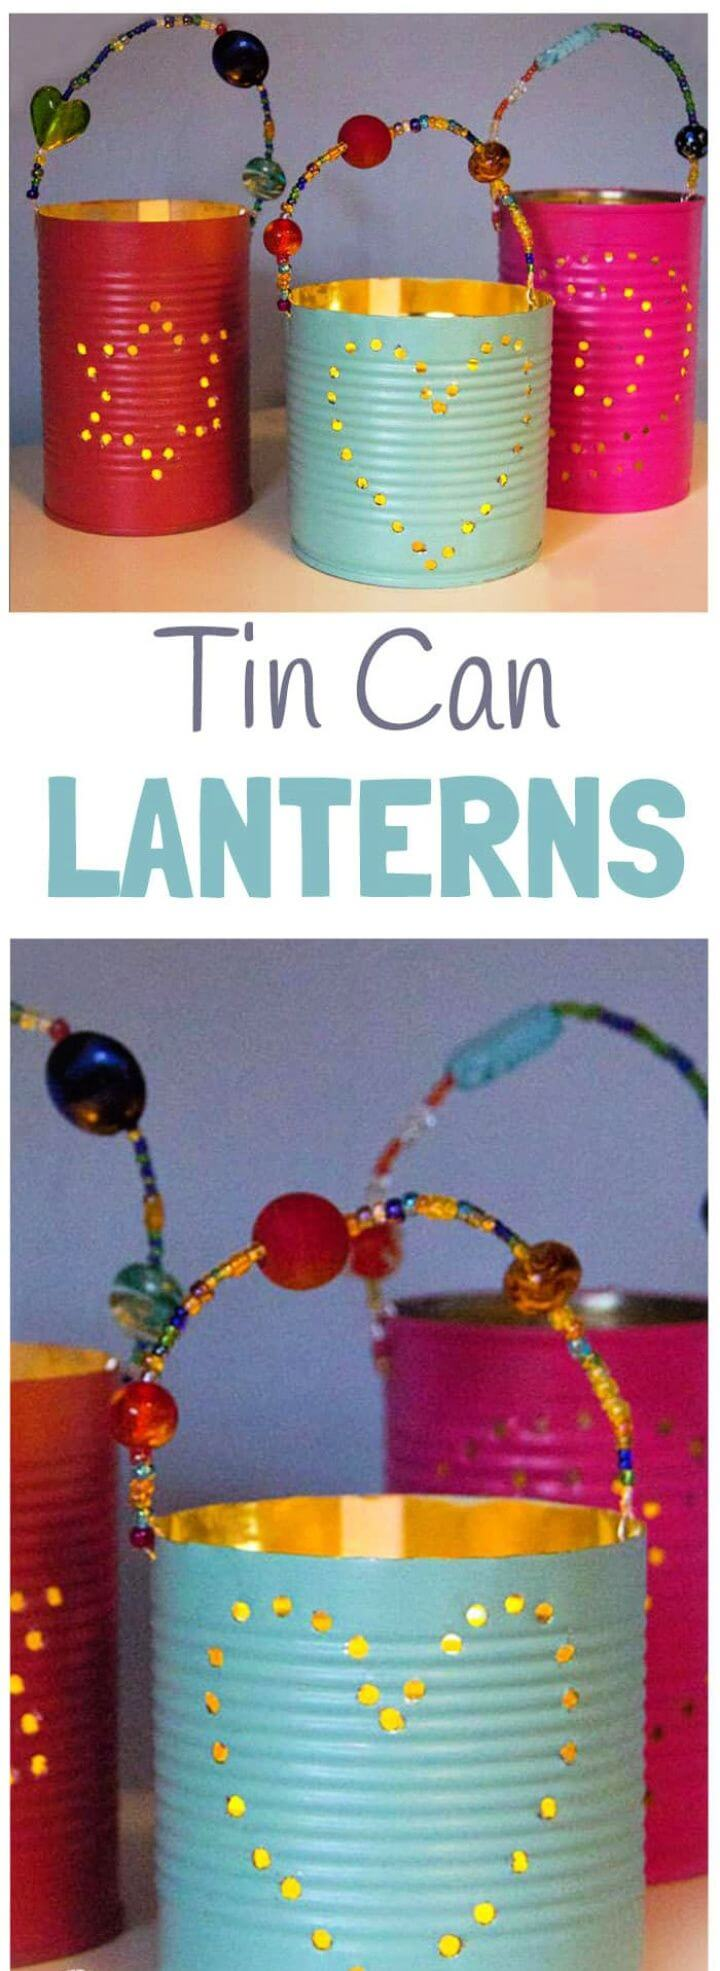 Homemade Gifts – DIY Tin Can Lanterns